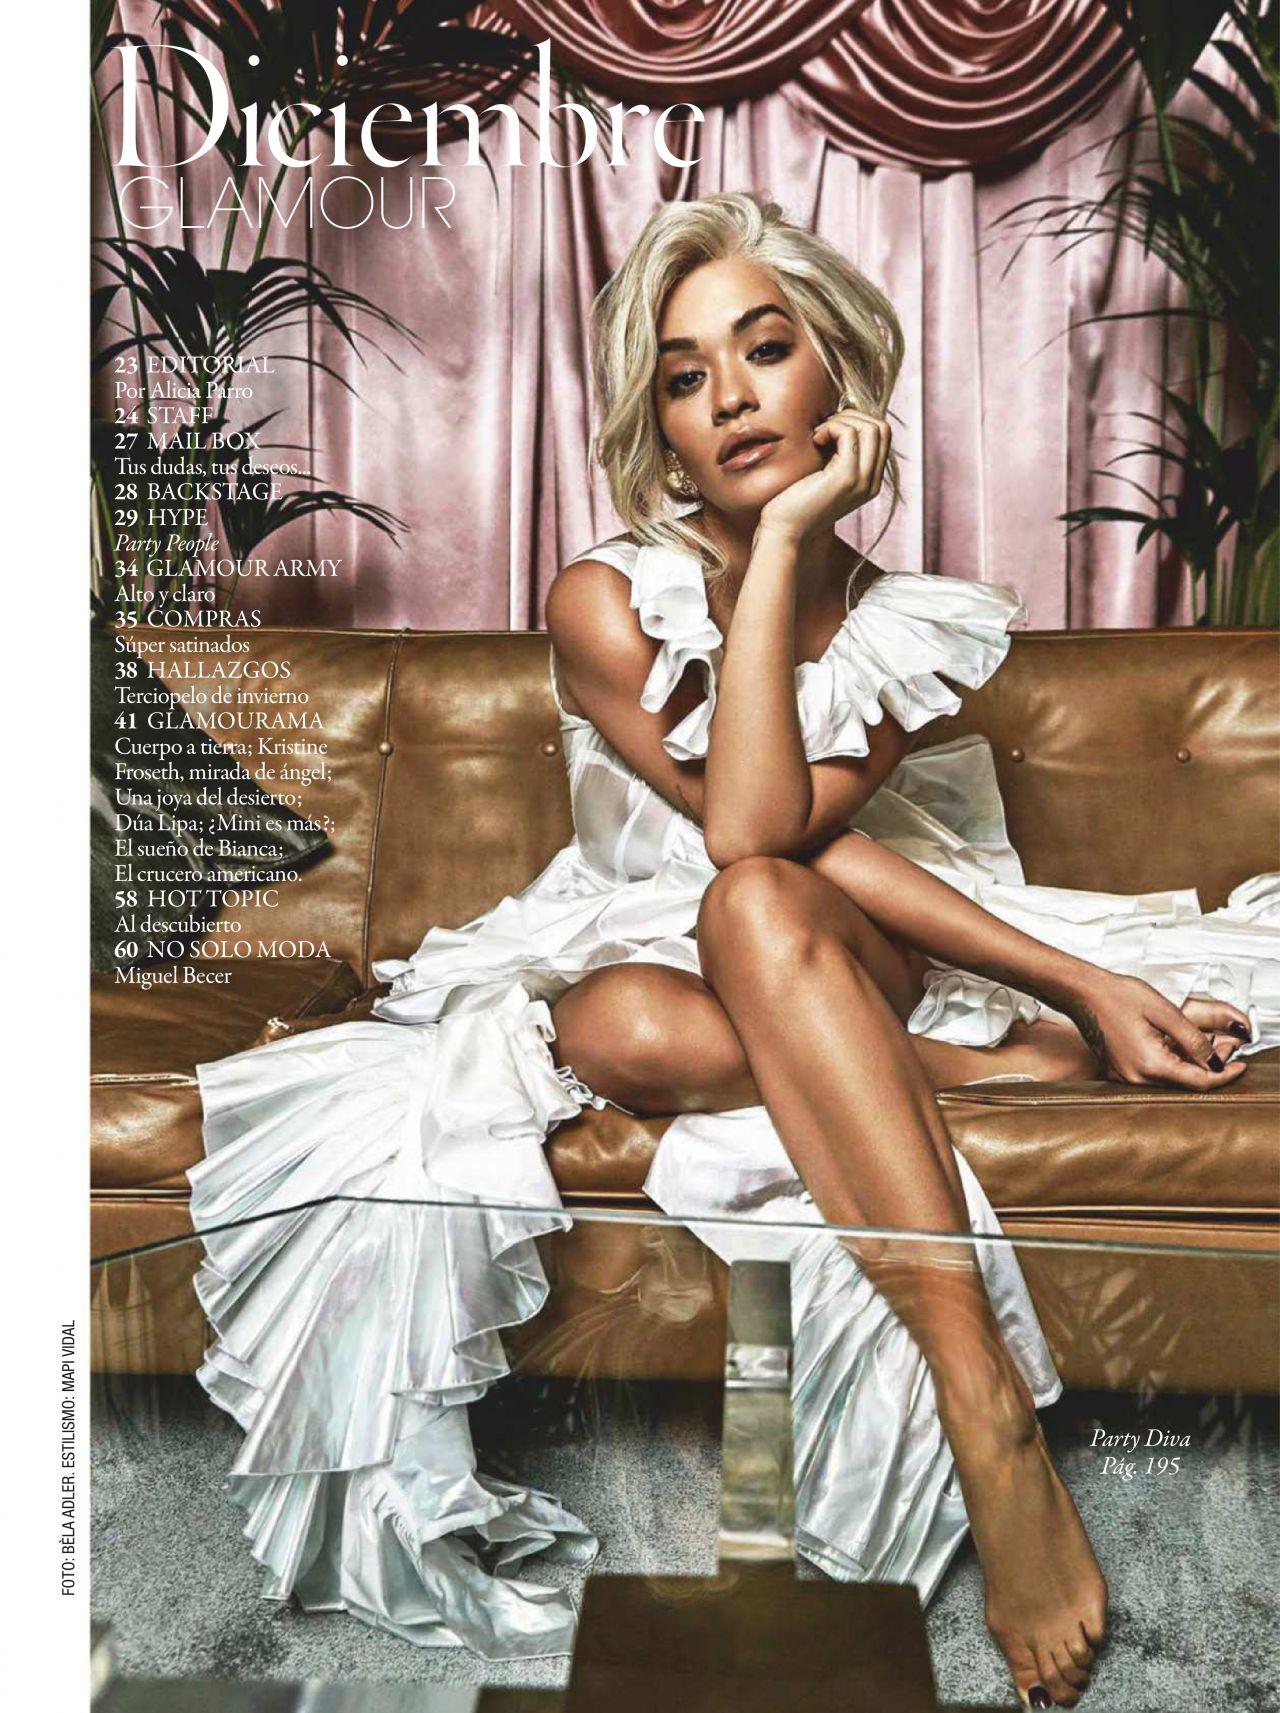 https://celebmafia.com/wp-content/uploads/2018/11/rita-ora-glamour-magazine-spain-11-2018-4.jpg